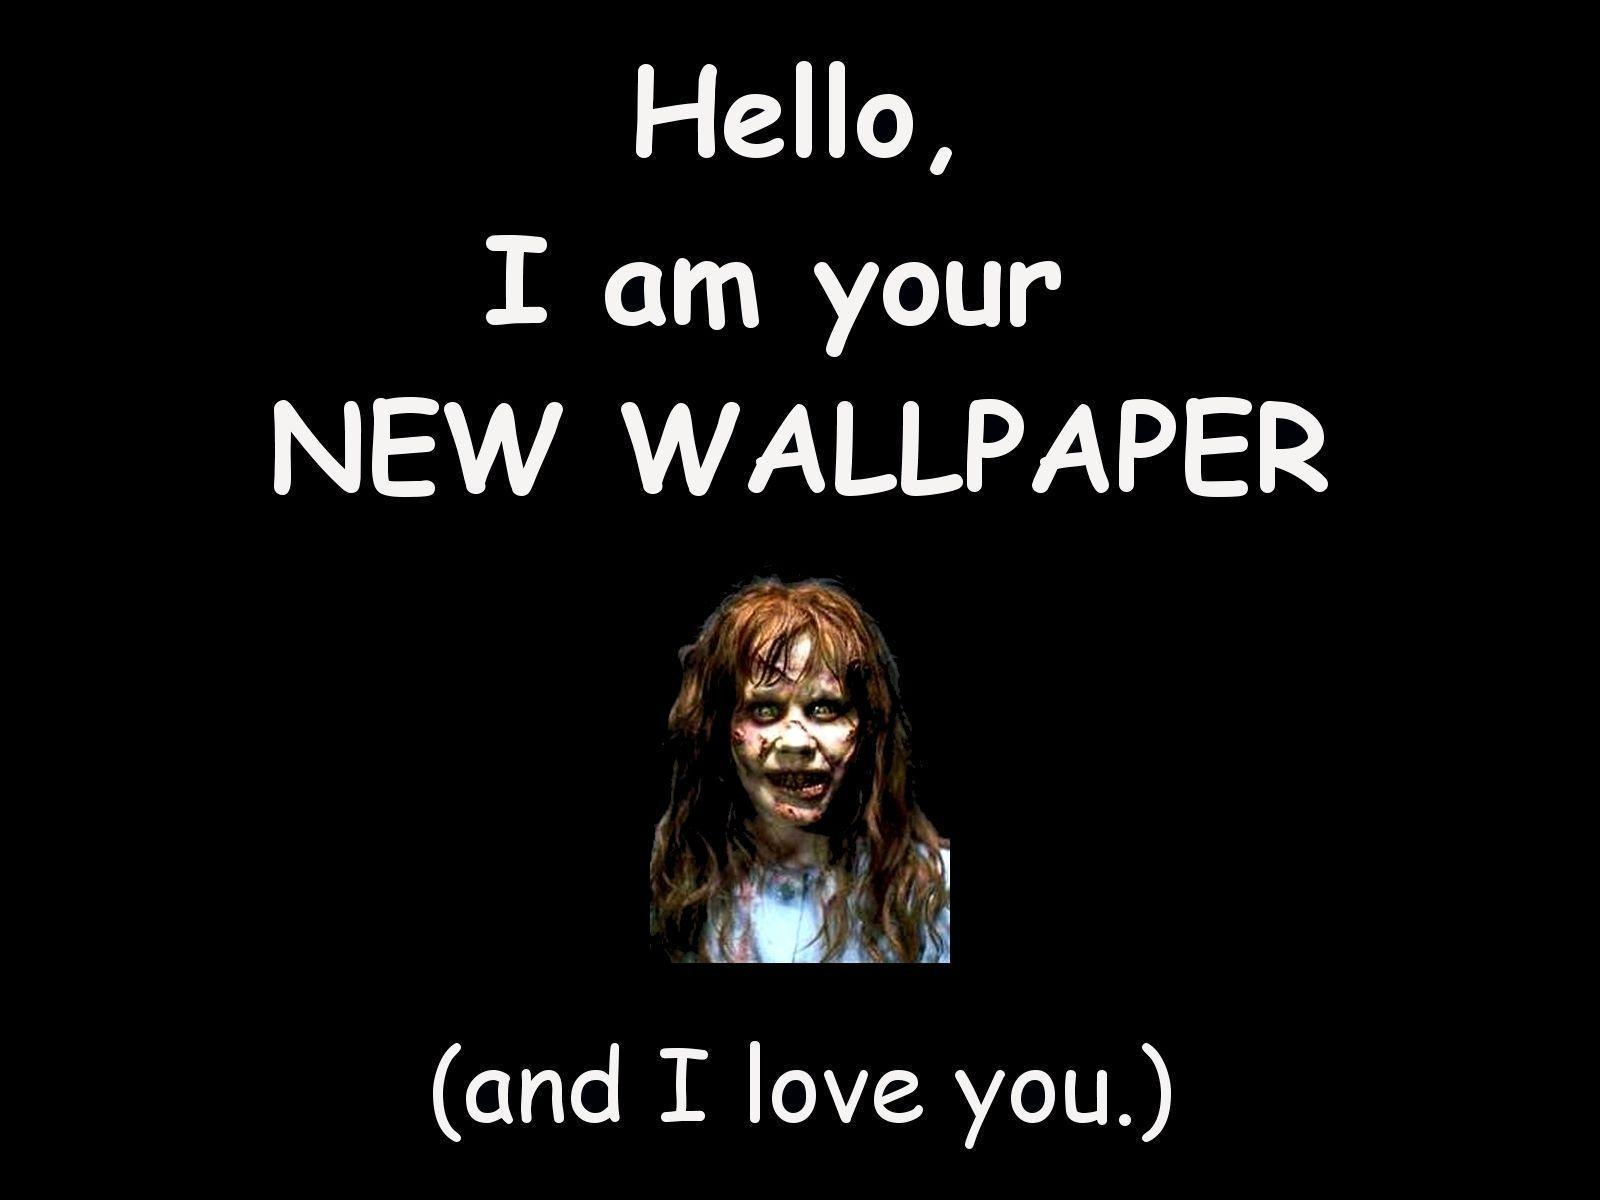 Joke Wallpapers Wallpaper Cave HD Wallpapers Download Free Images Wallpaper [1000image.com]